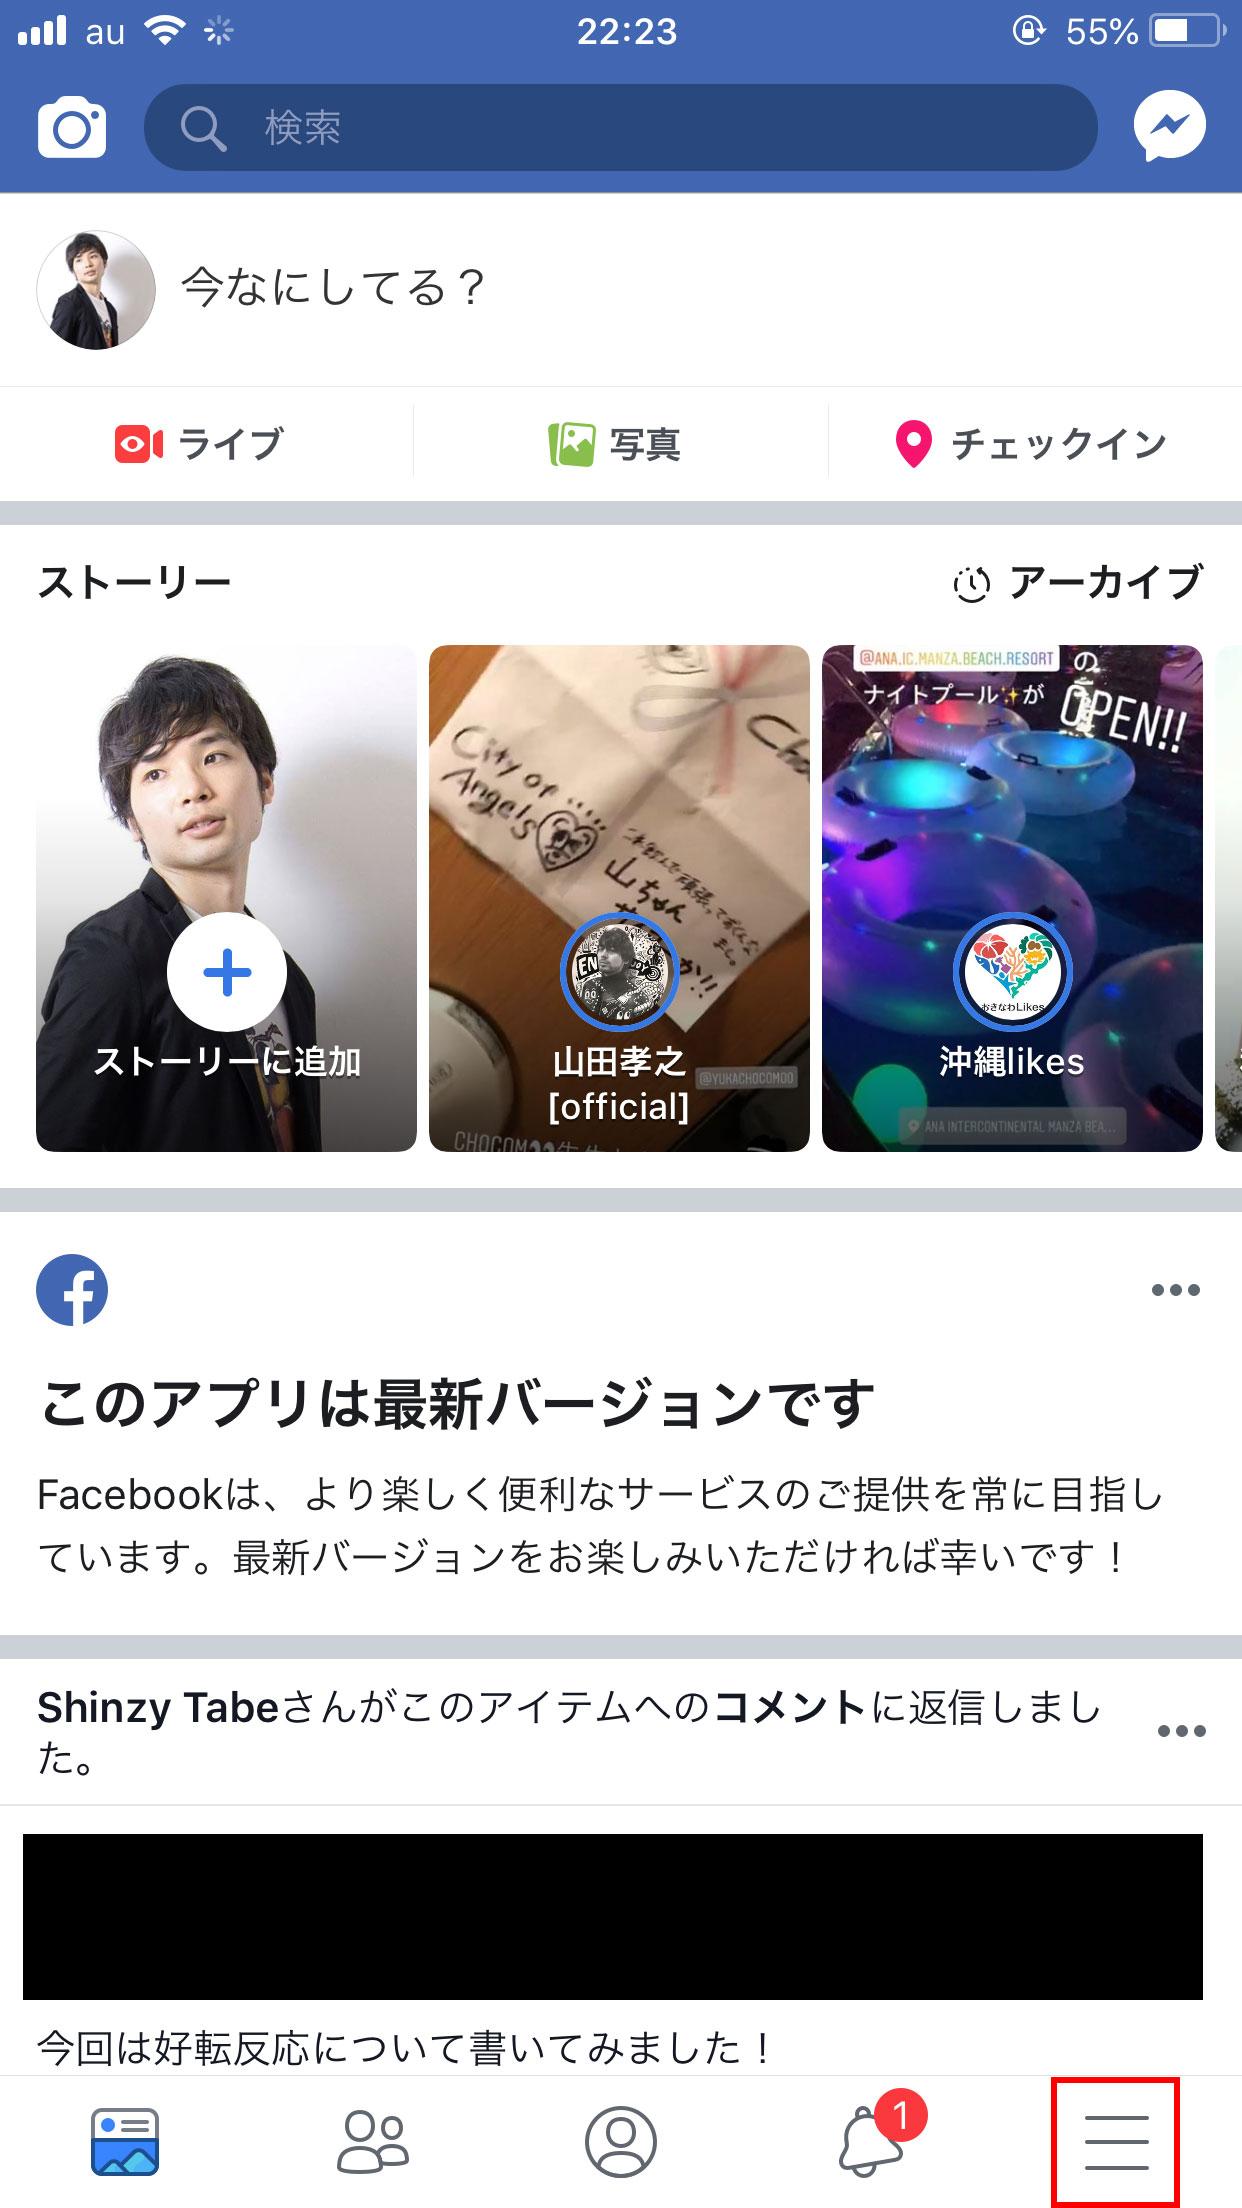 Facebookのホーム画面